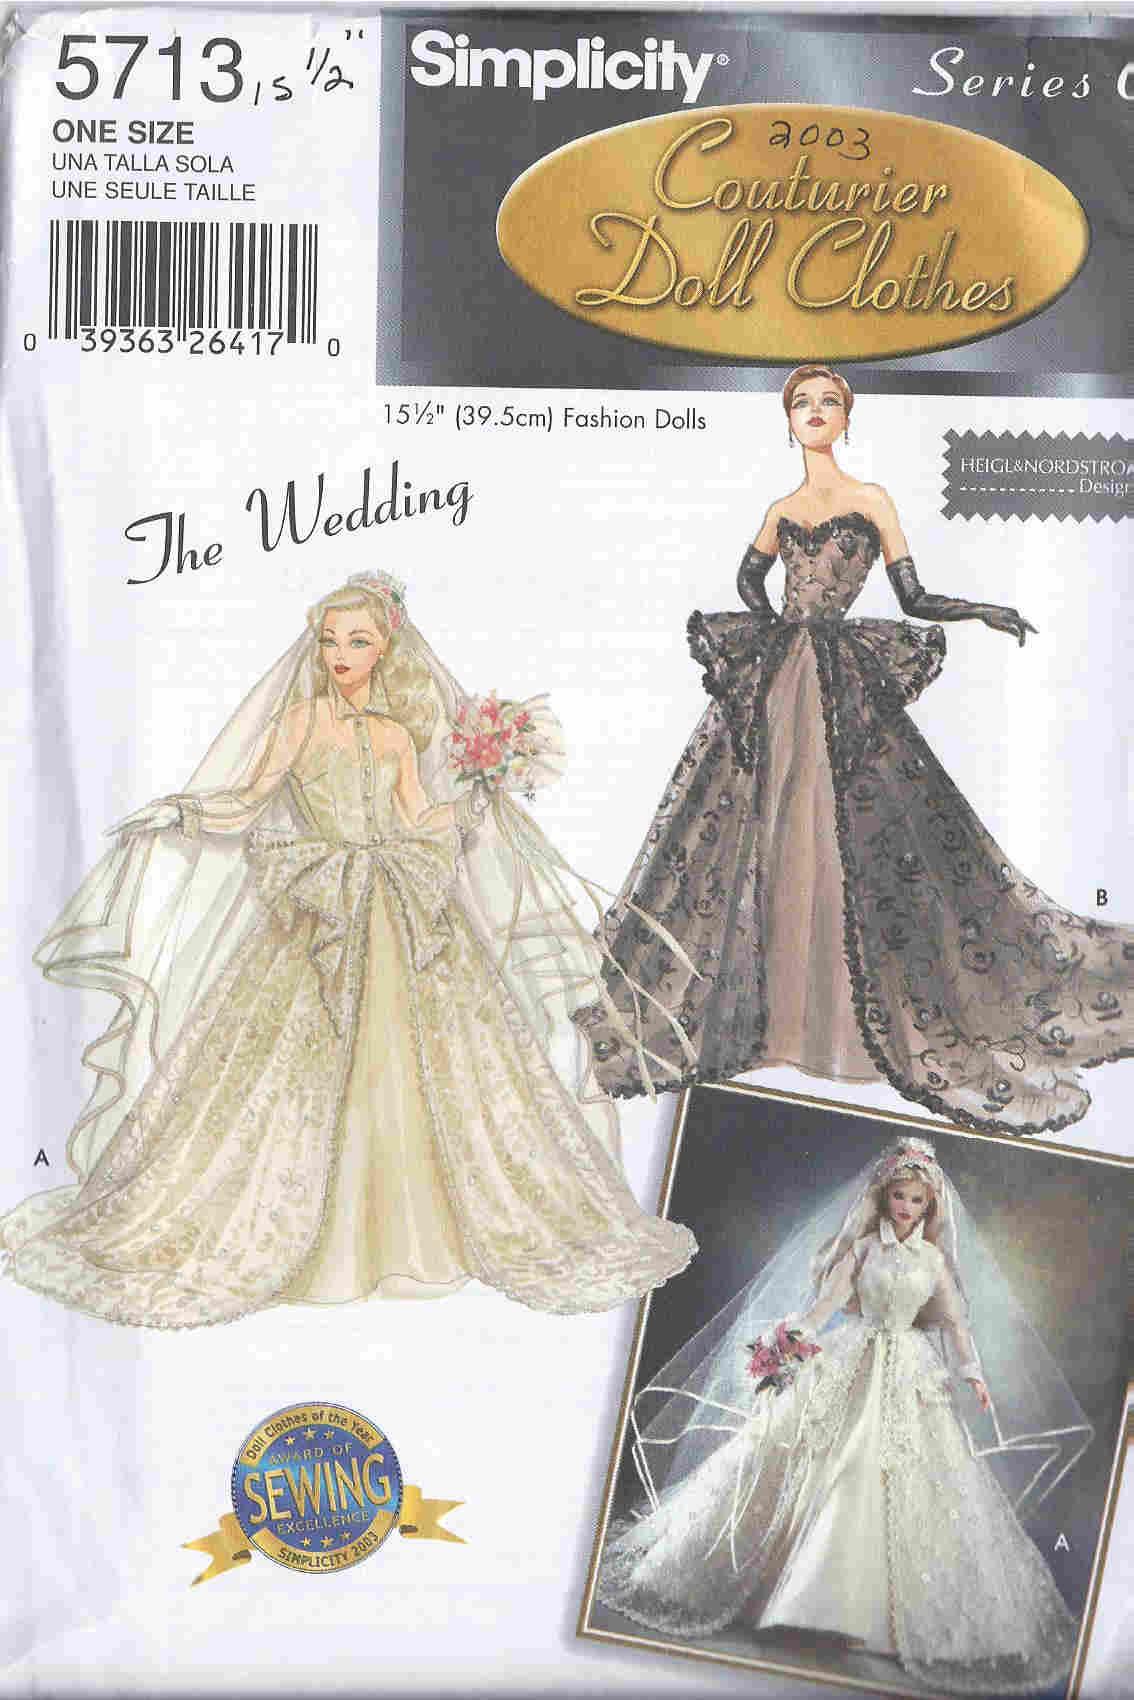 gene wedding dress gloves veil fashion doll sewing pattern